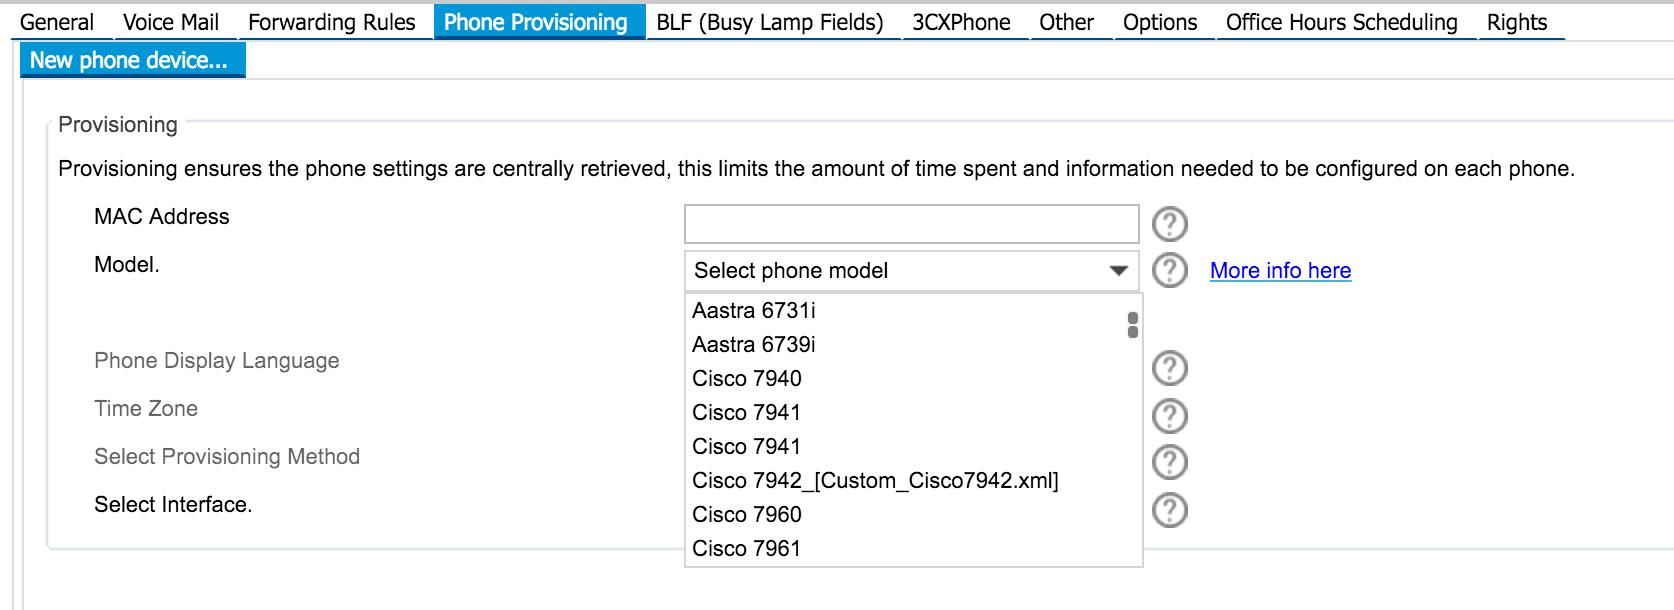 Configuring 3CX for Cisco 7942 - Austen Consultants IT